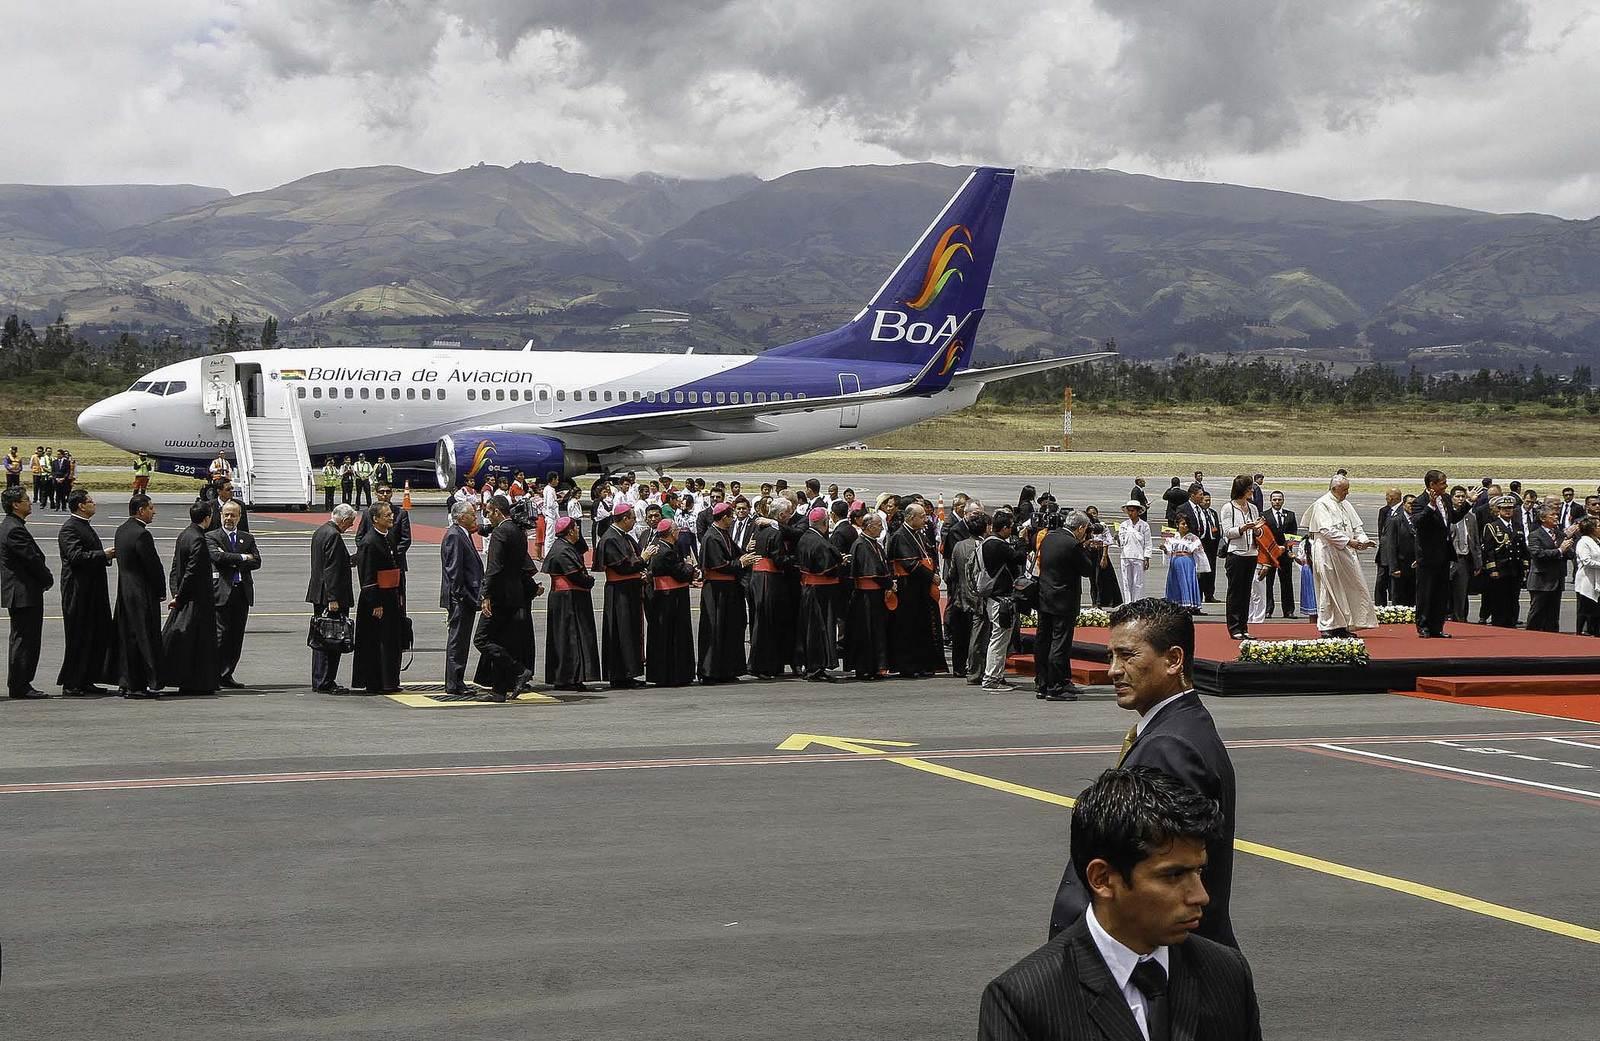 pope francis1 Pope Francis leaving Ecuador